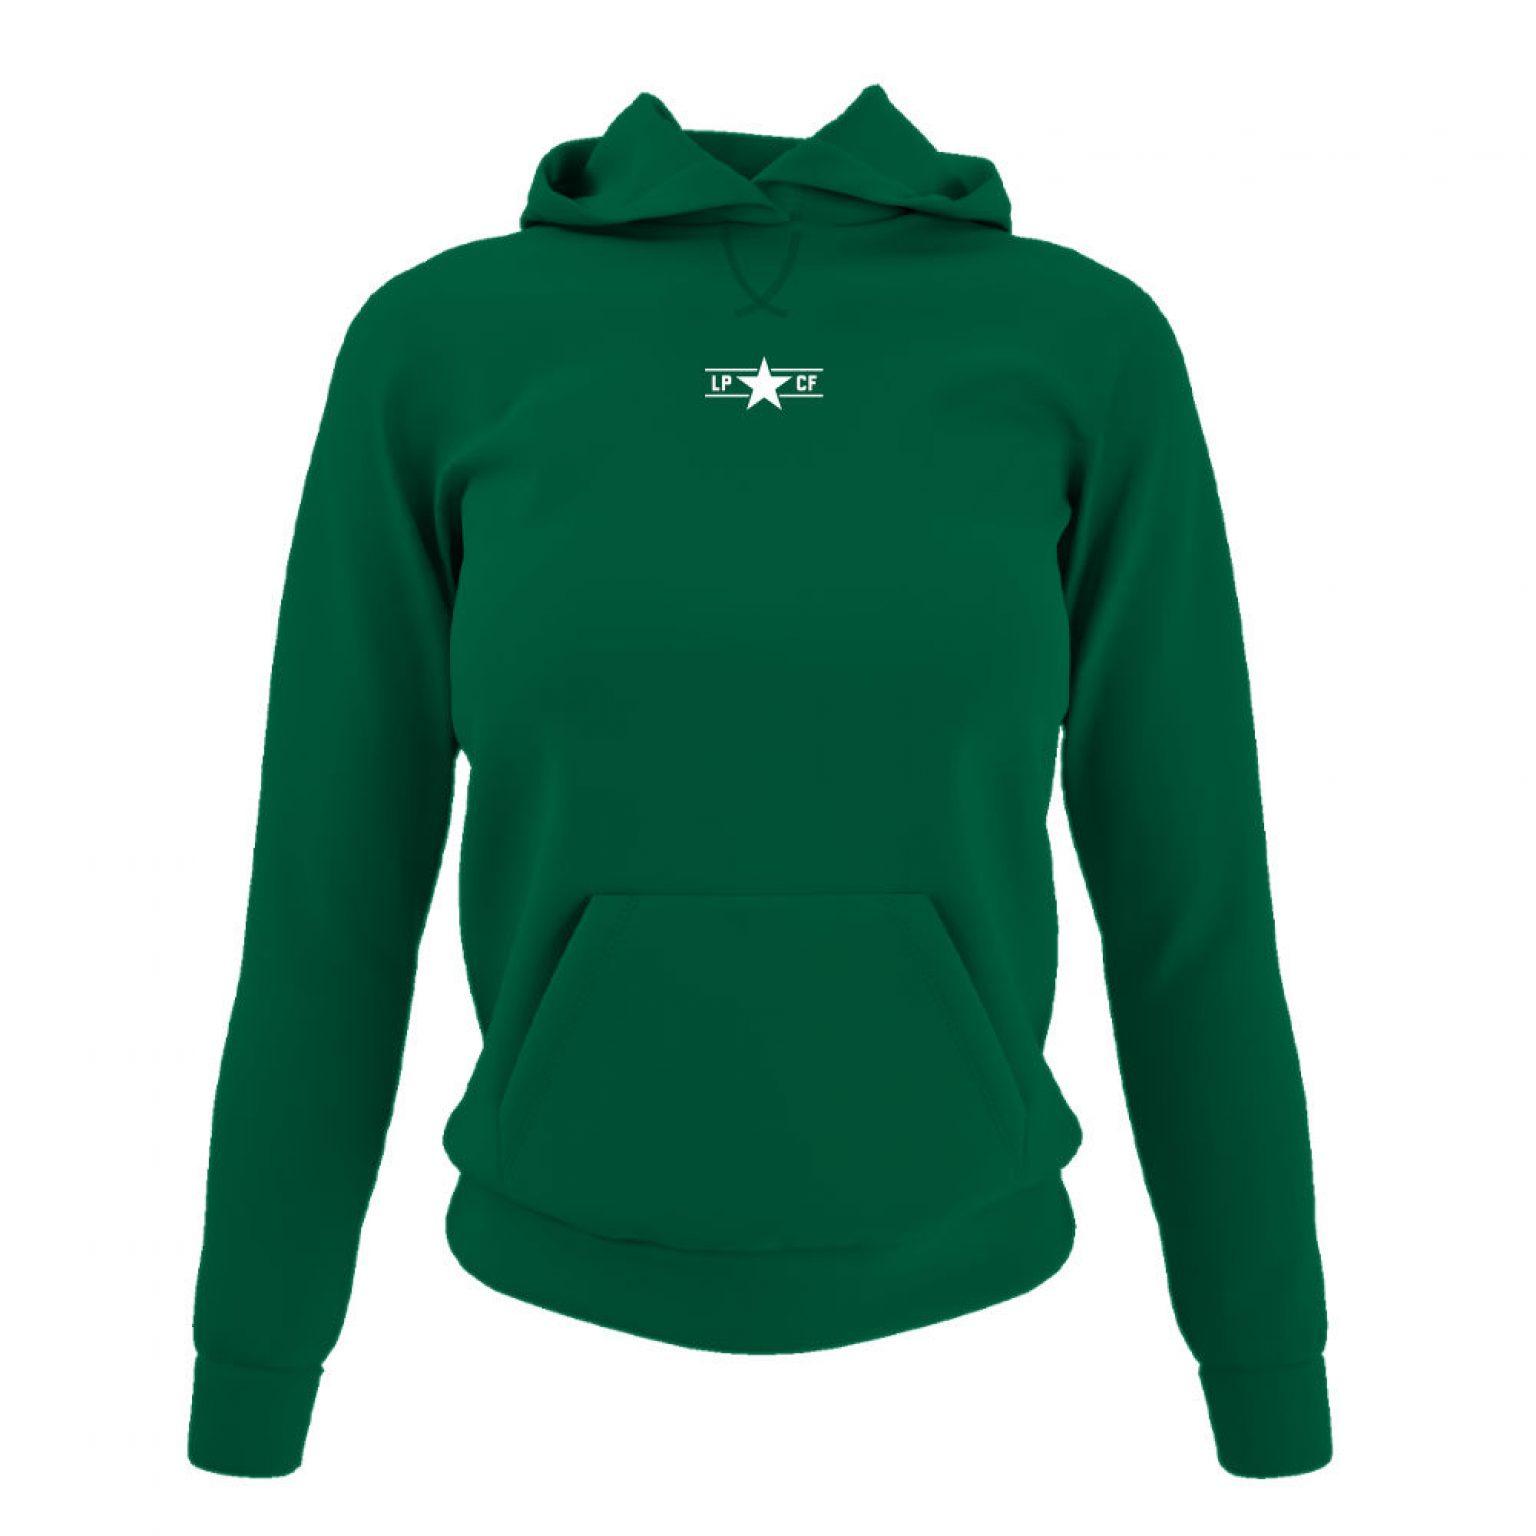 LPcircle hoodie damen green front